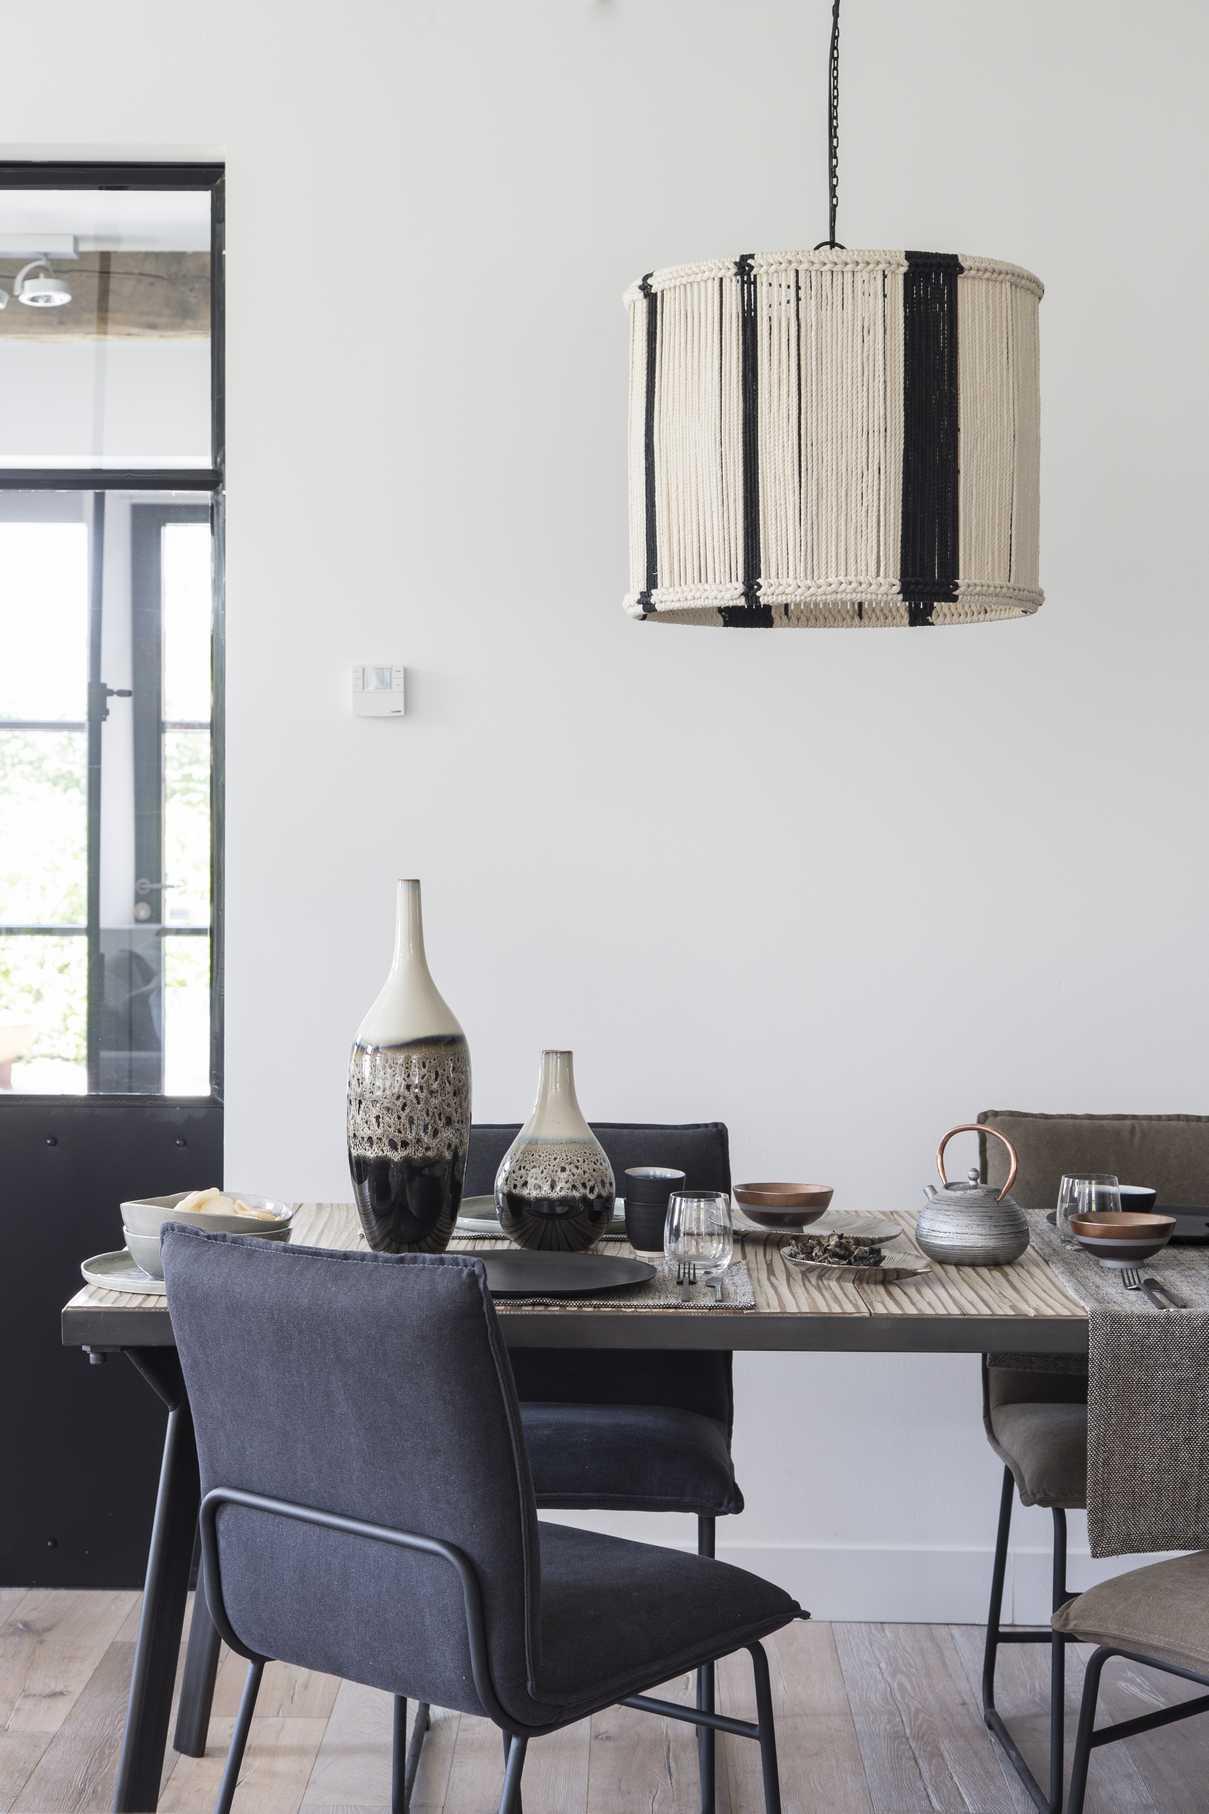 spiritual pomax home collection. Black Bedroom Furniture Sets. Home Design Ideas